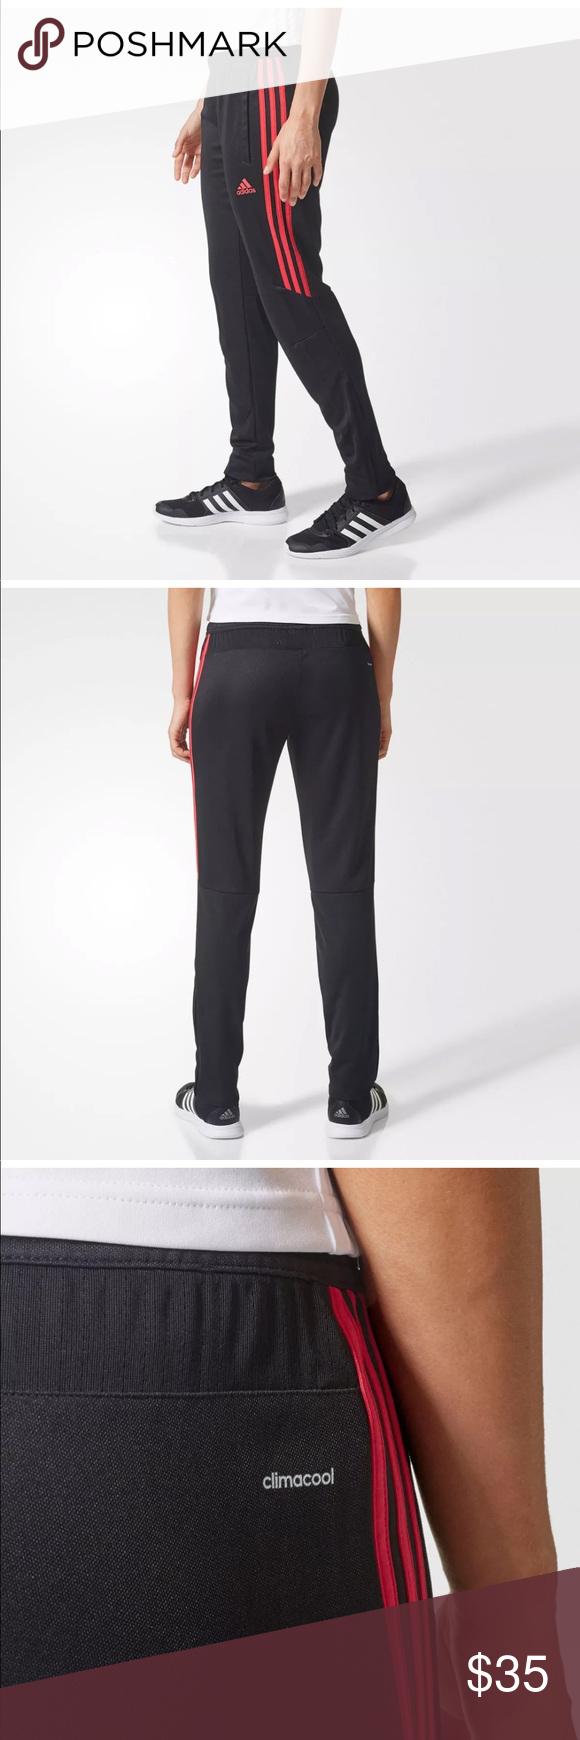 997498919 Womens Adidas Tiro 17 Black Energy Pink [CF3612] Womens Adidas Tiro 17  Training Track Pants - Black Energy Pink Tiro17 adidas Pants Track Pants &  Joggers